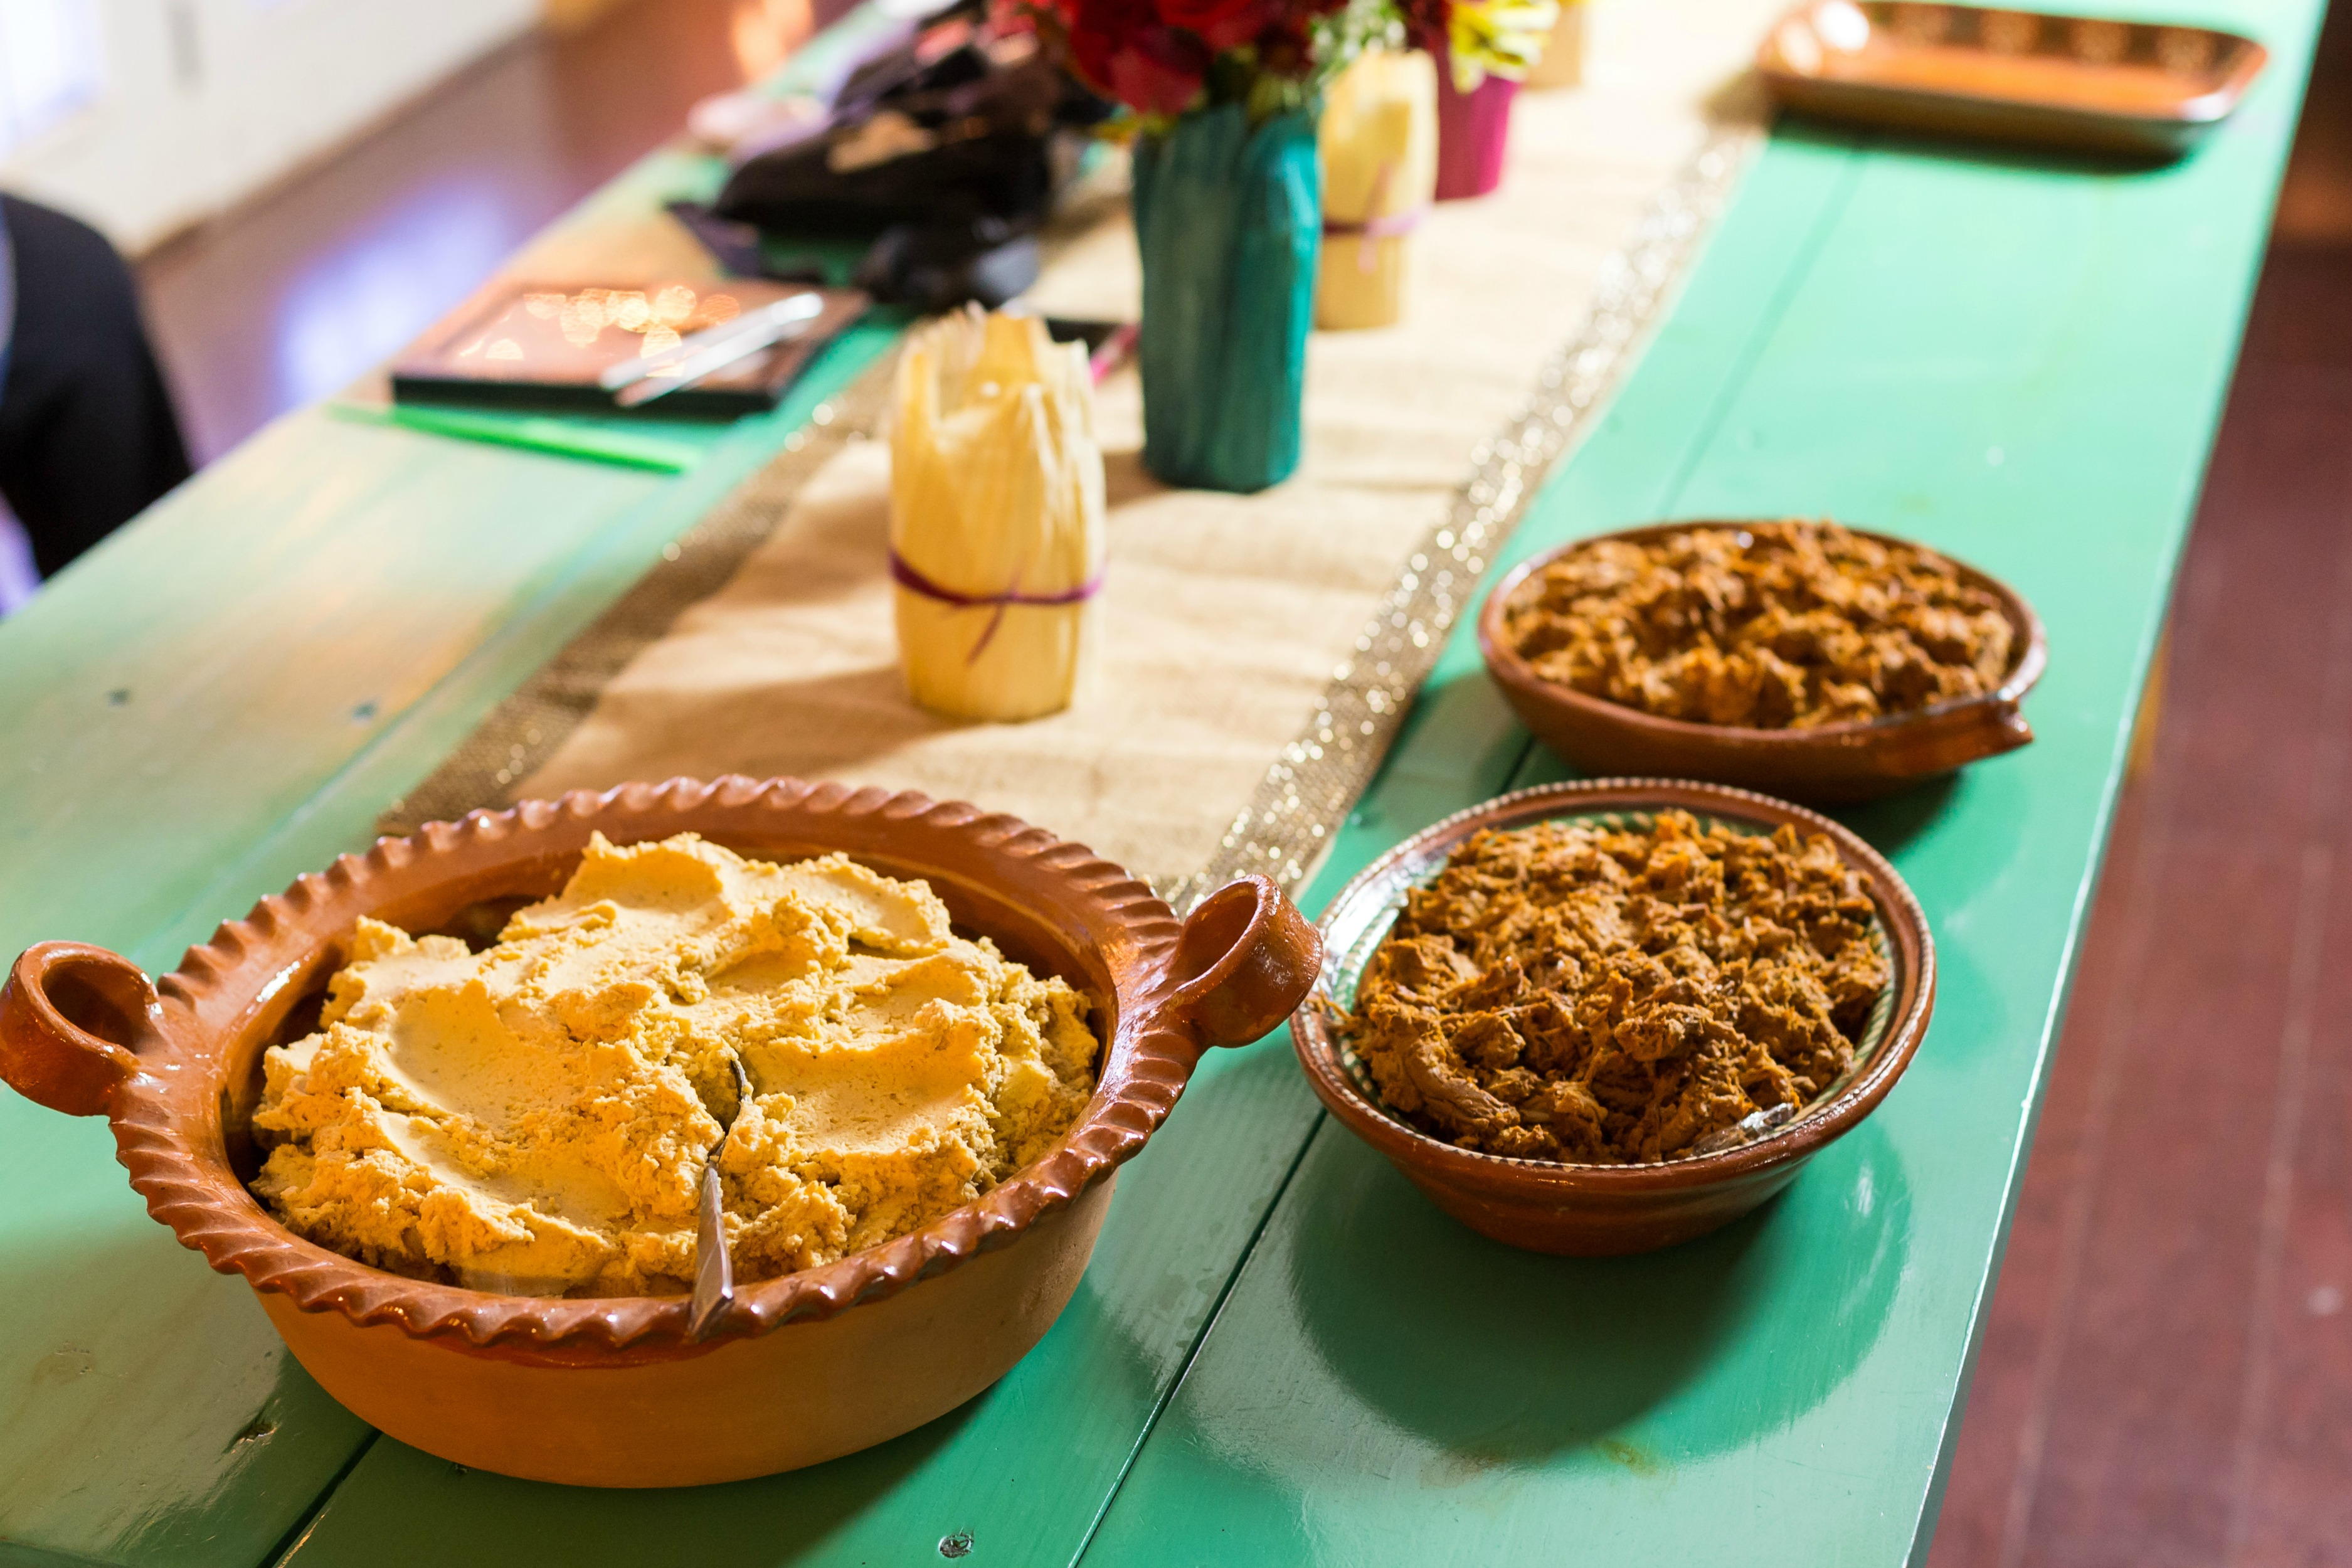 how-to-prepare-pork-filling-for-tamales-vianneyrodriguez-sweetlifebake